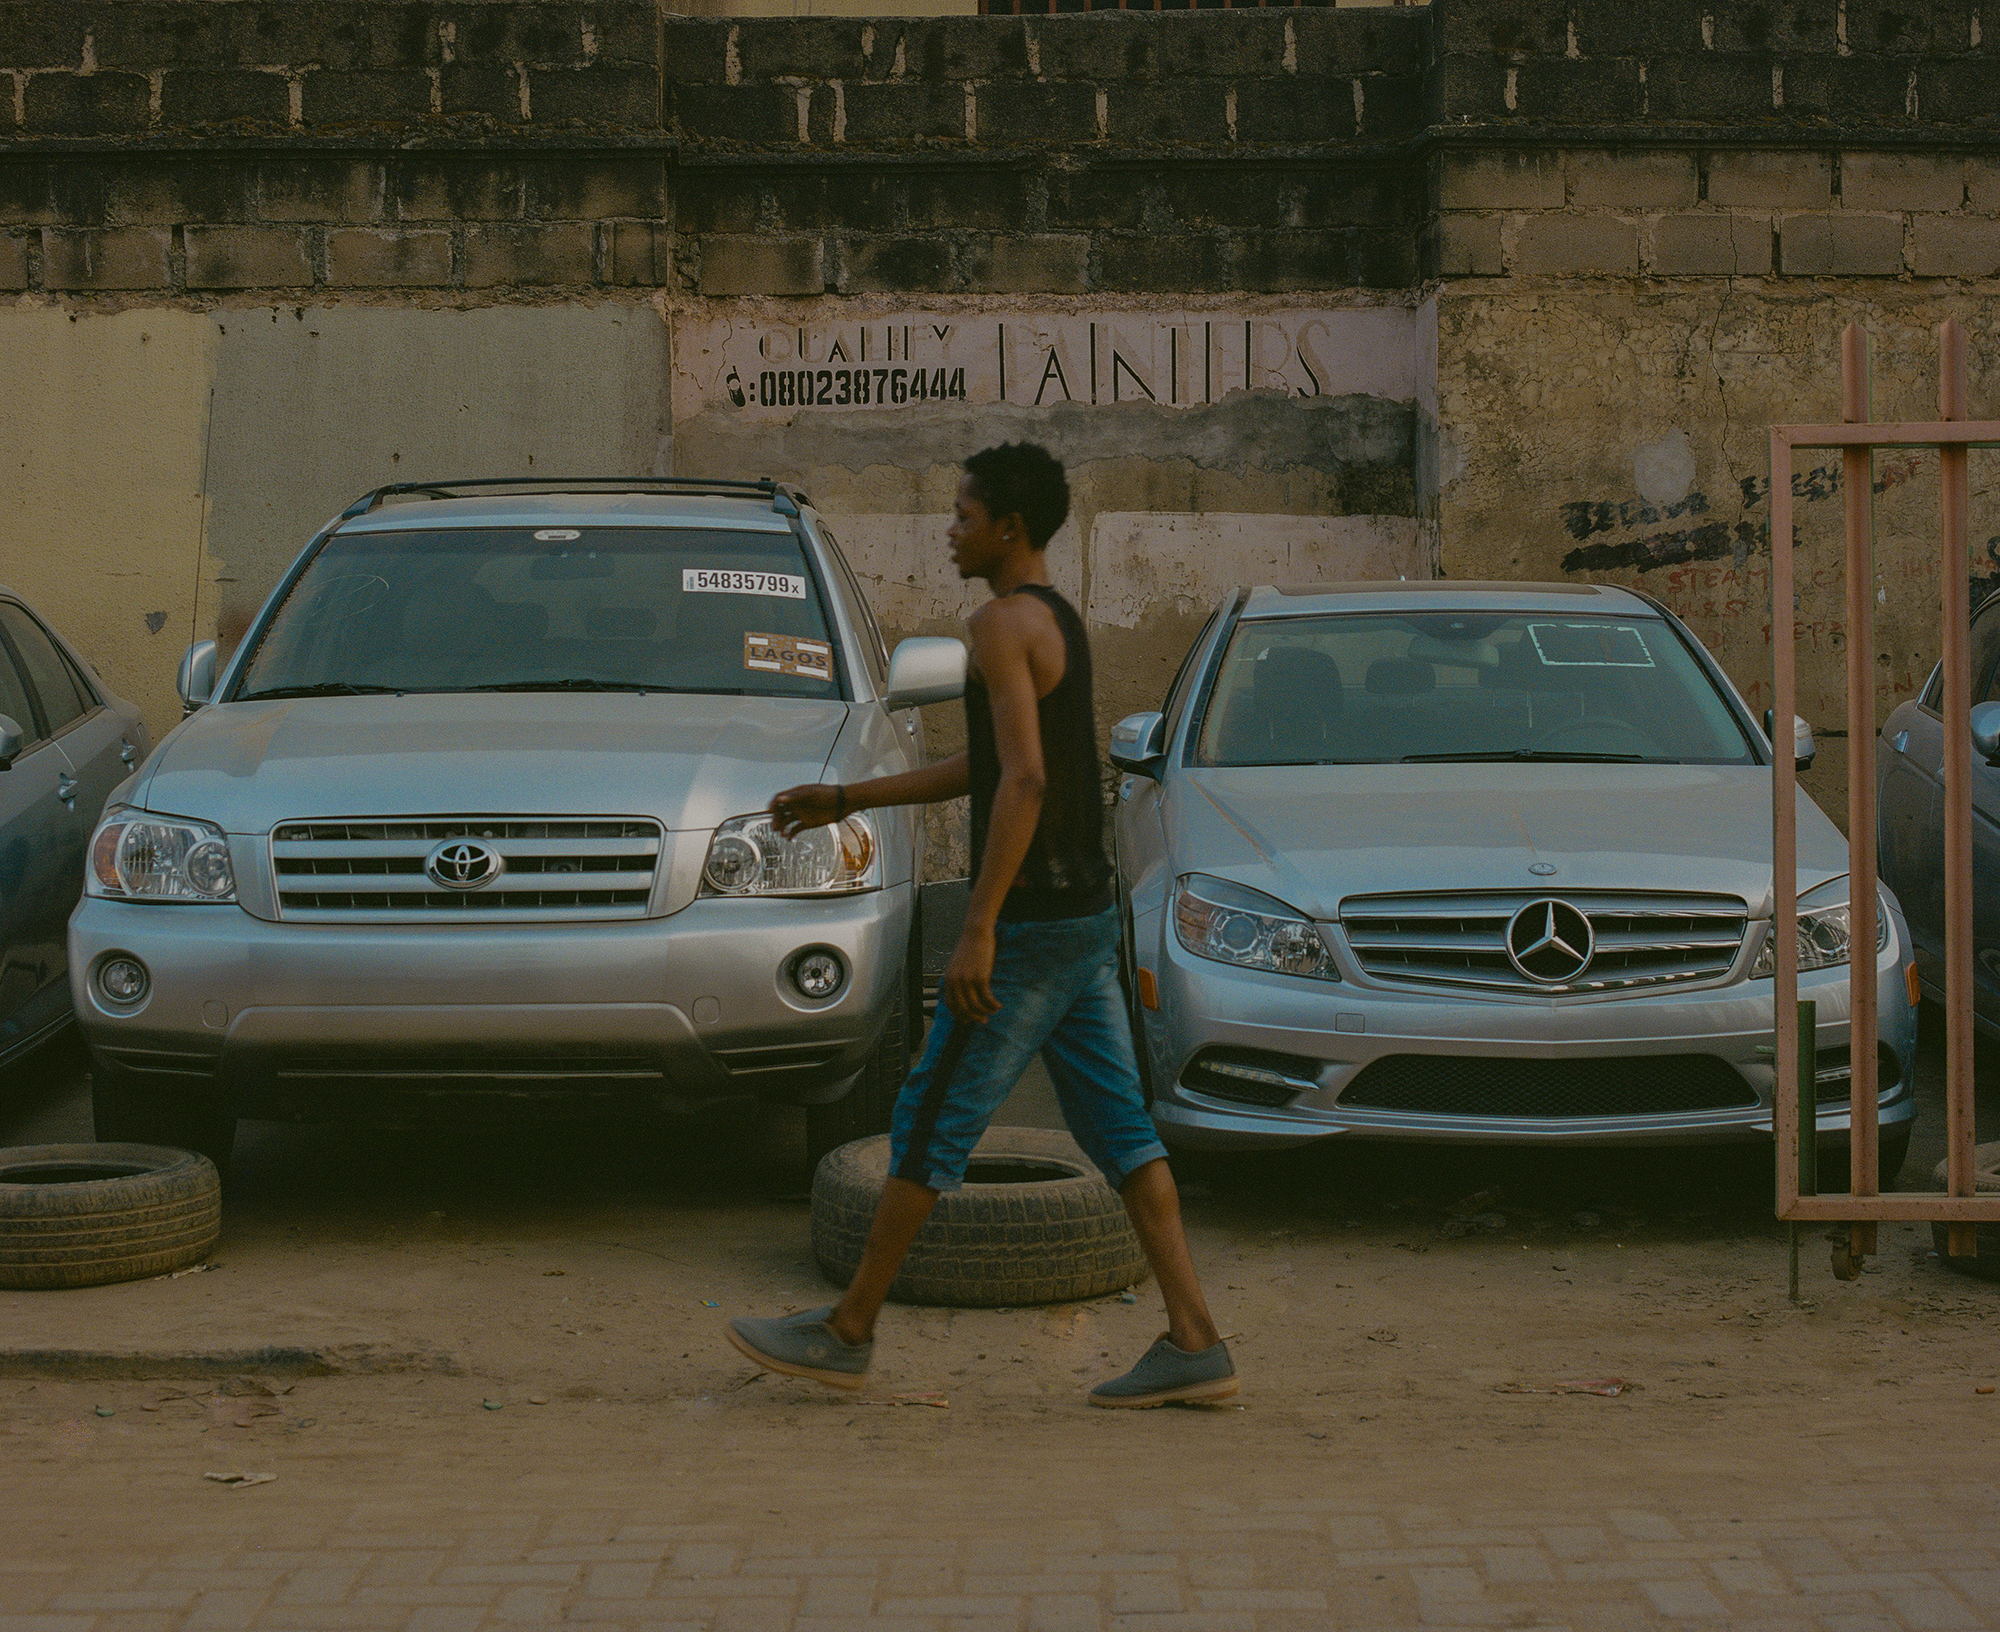 Lelaki berjalan di depan barisan mobil